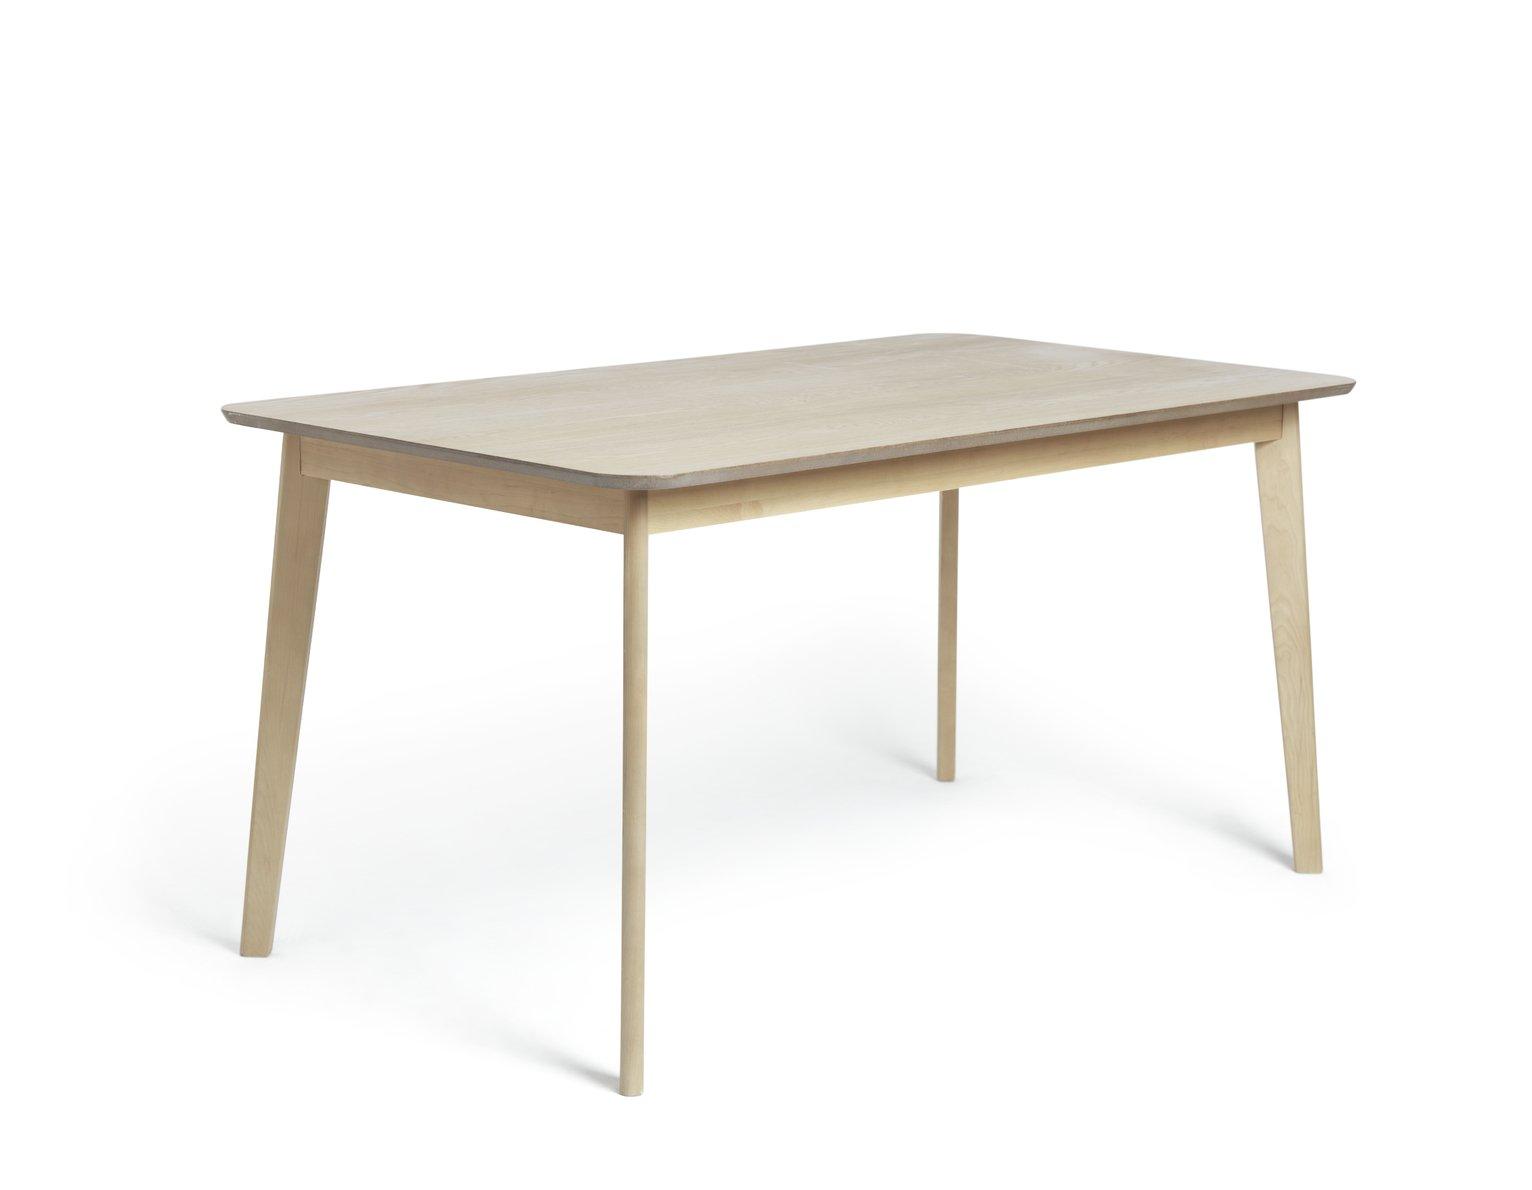 Habitat Skandi Solid Wood Dining Table & 4 Black Chairs